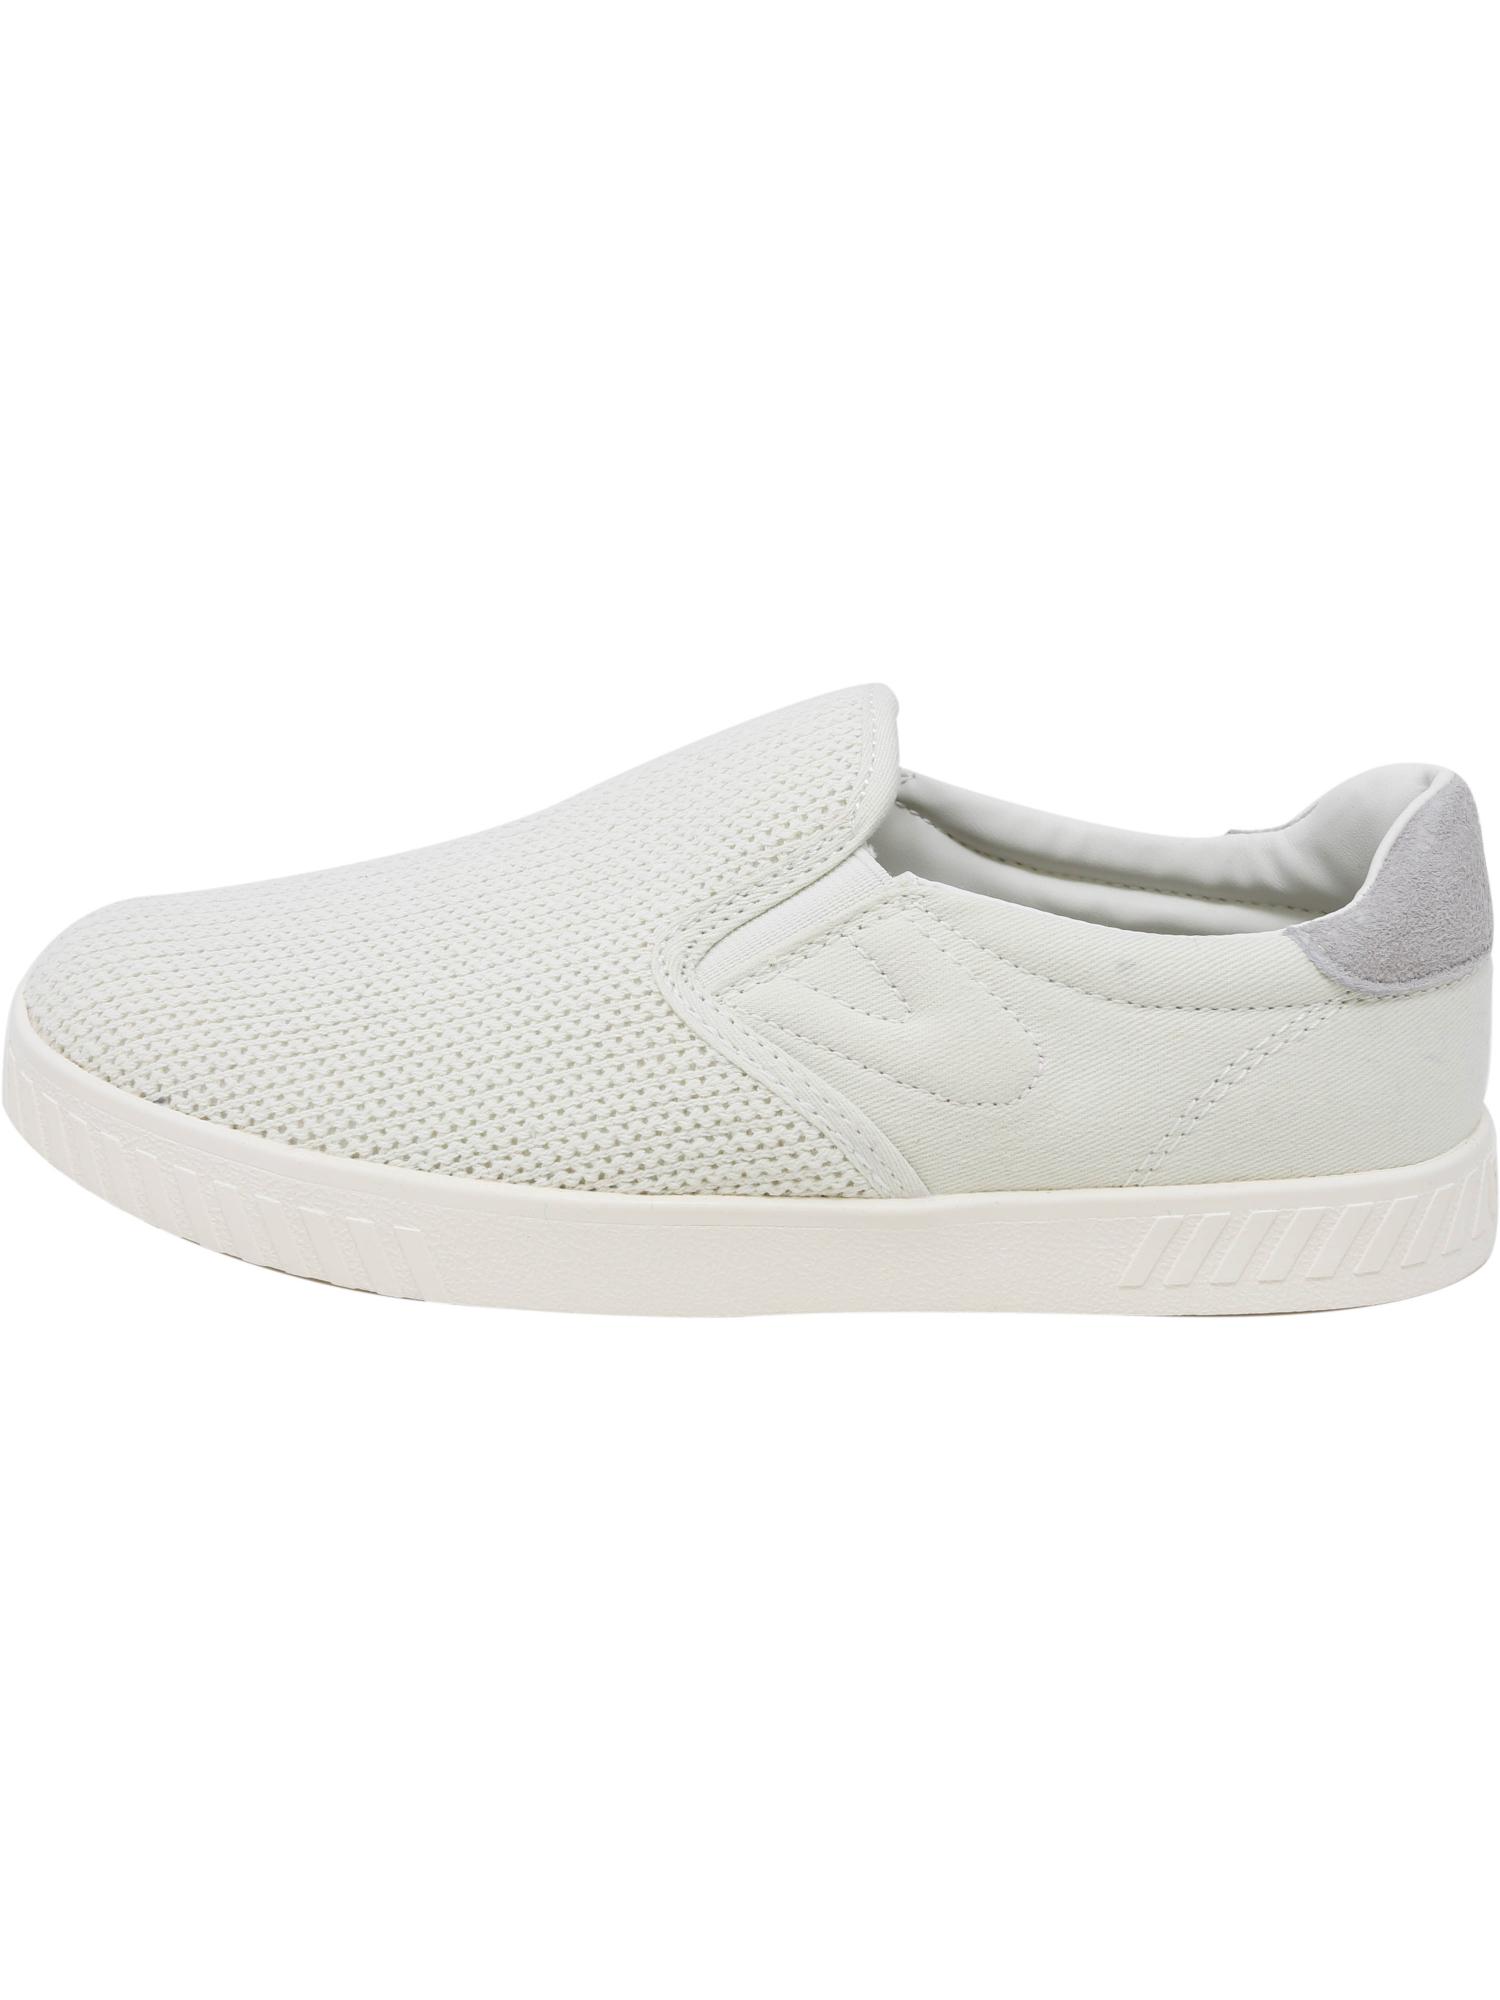 Tretorn-Femmes-Cruz-tissu-aux-chevilles-Haute-Slip-Chaussures-en miniature 13